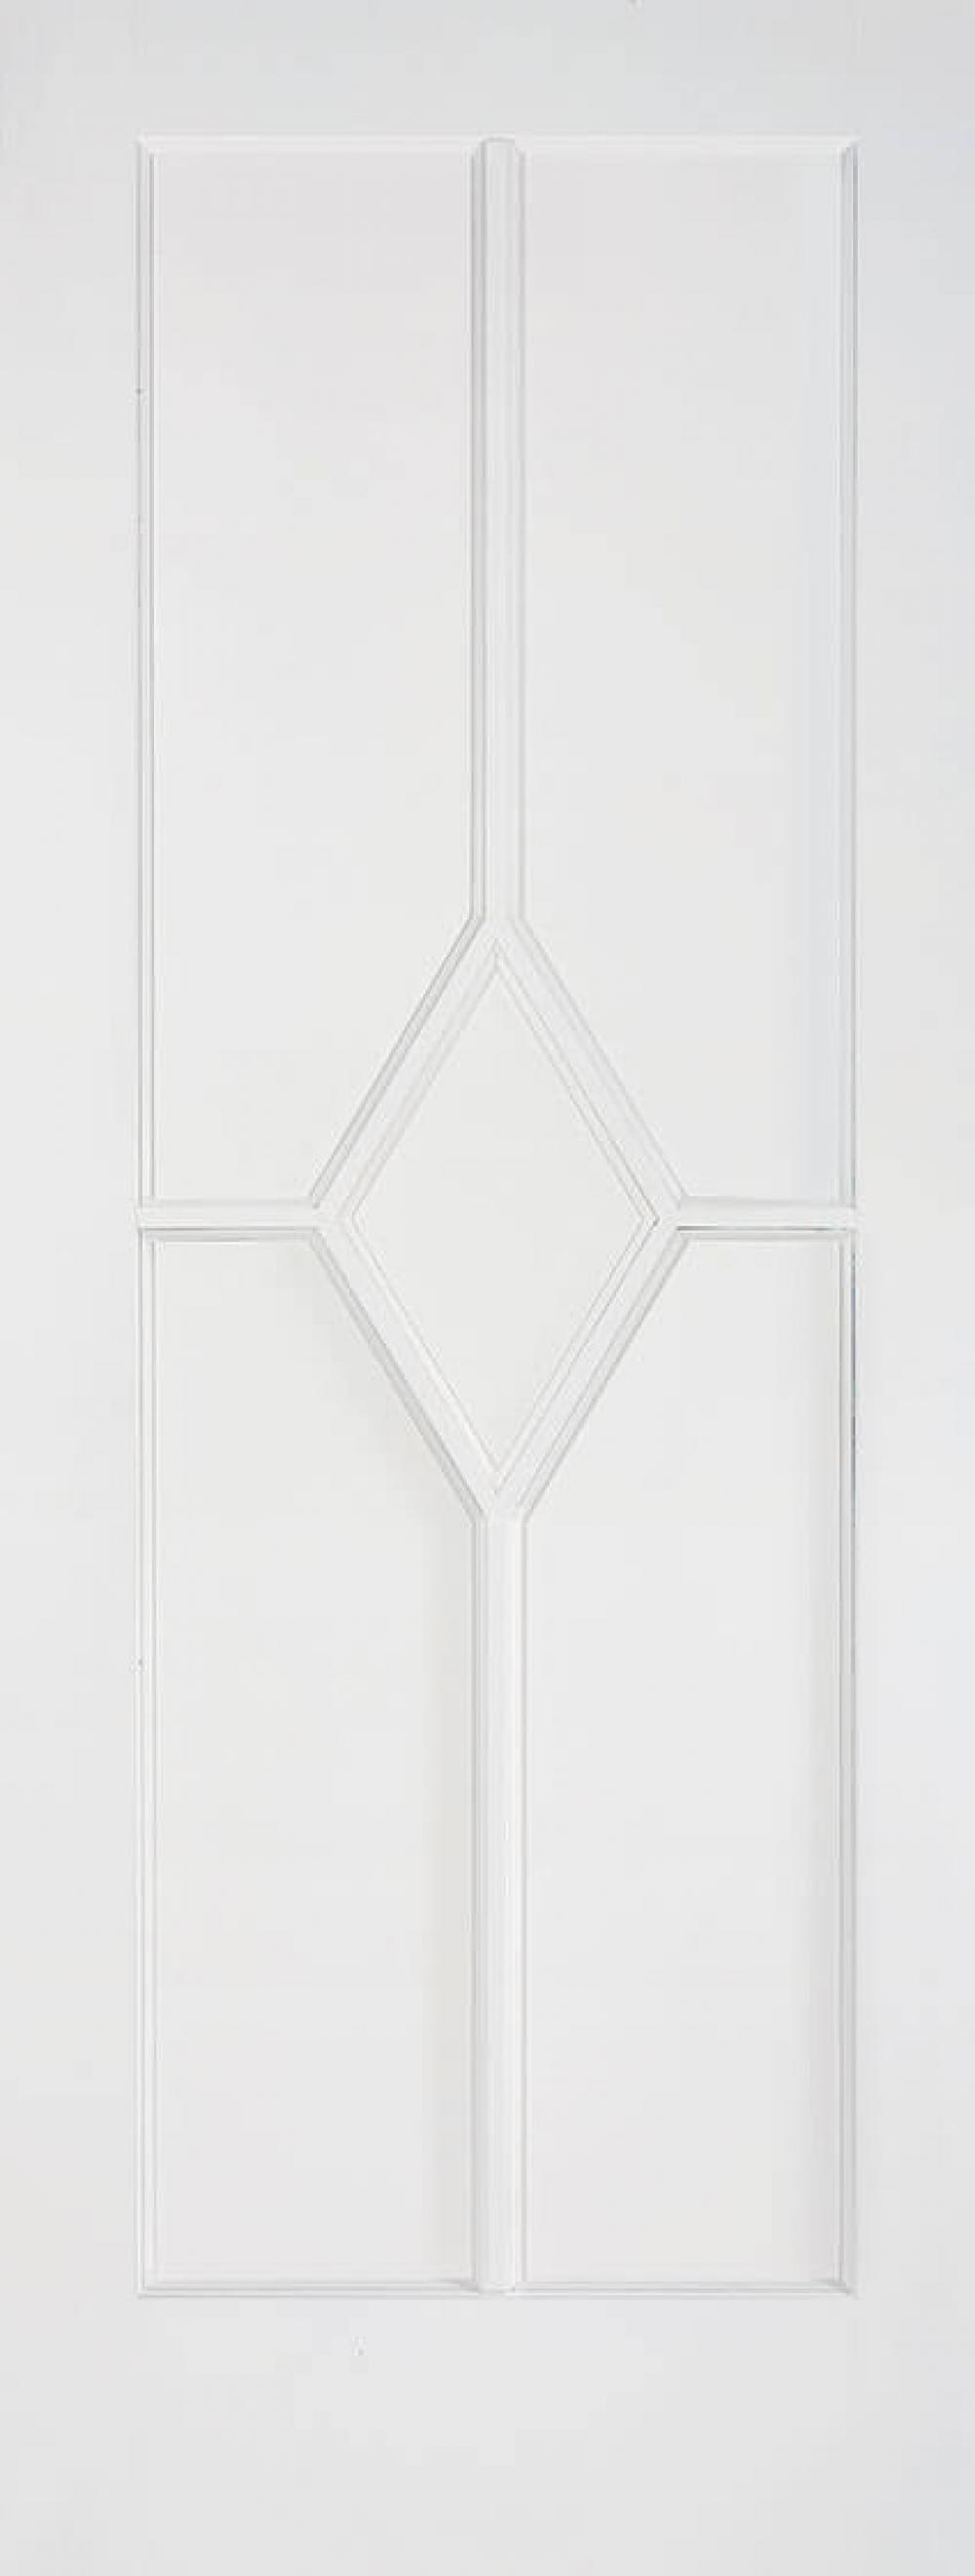 Reims White 5 Panel Image